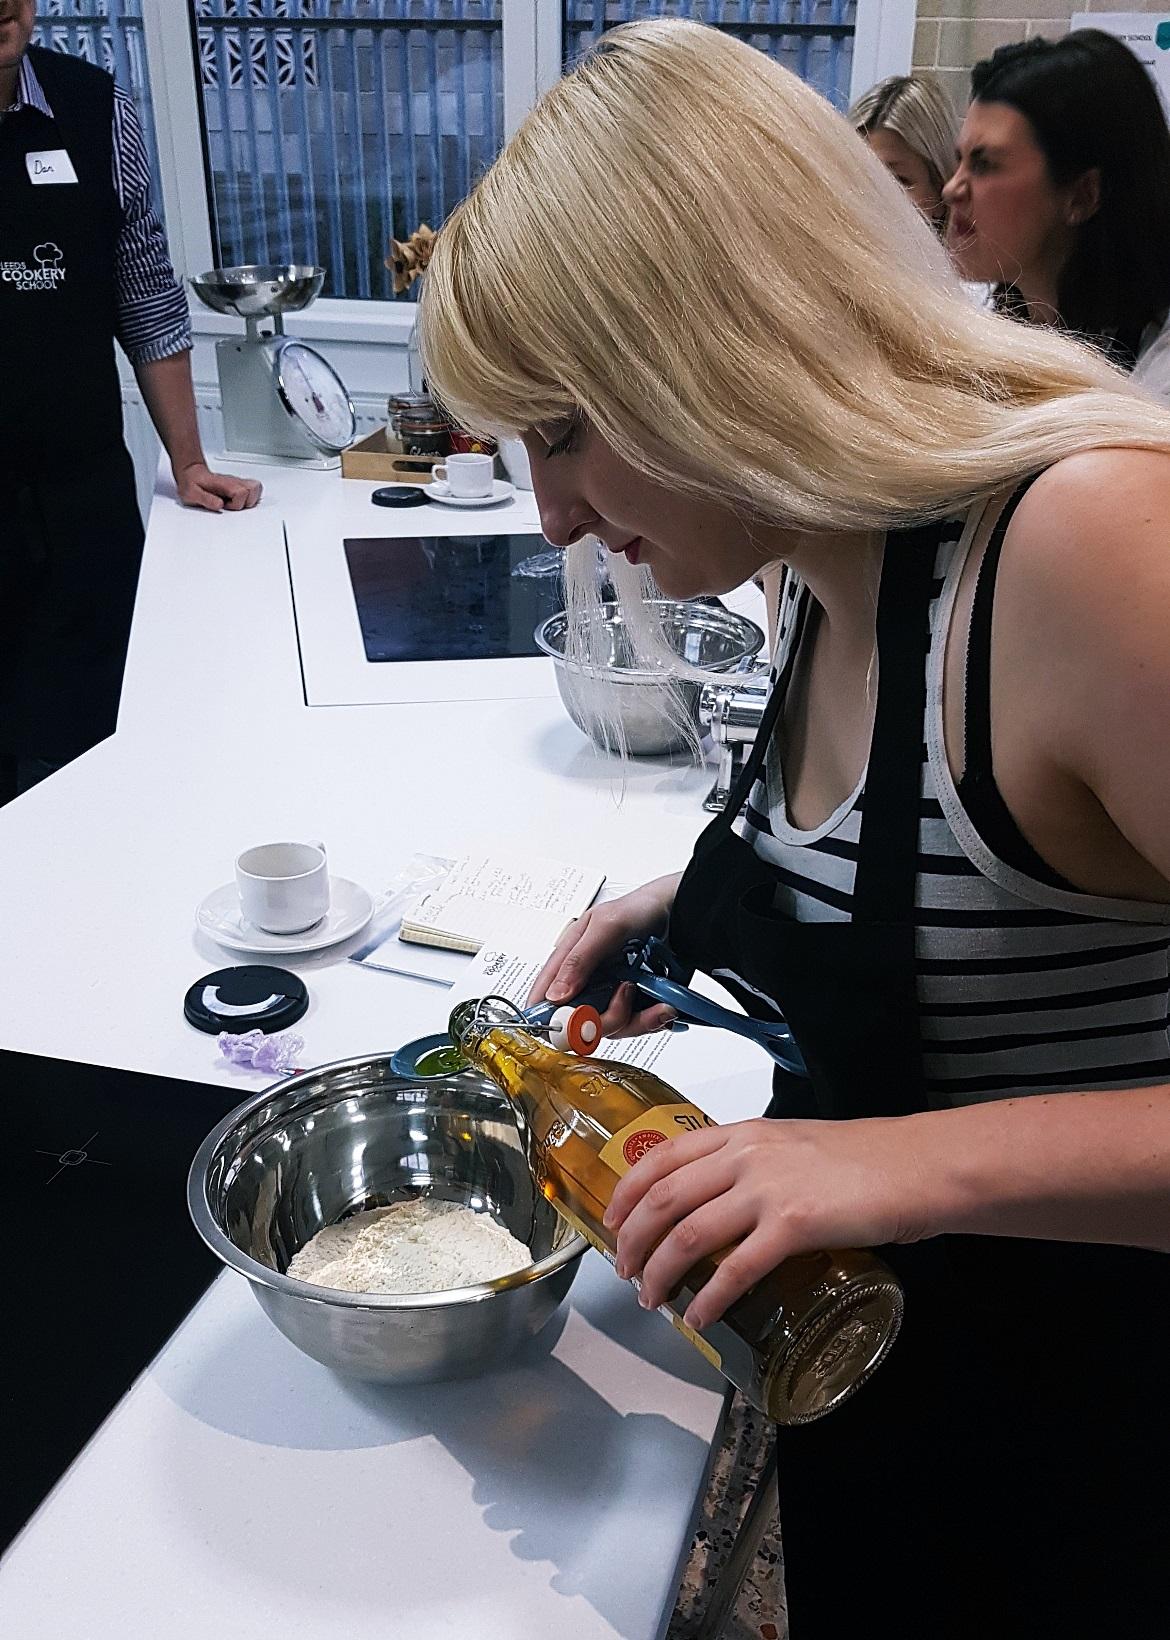 Making pasta dough at Leeds Cookery School - September Monthly Recap by BeckyBecky Blogs